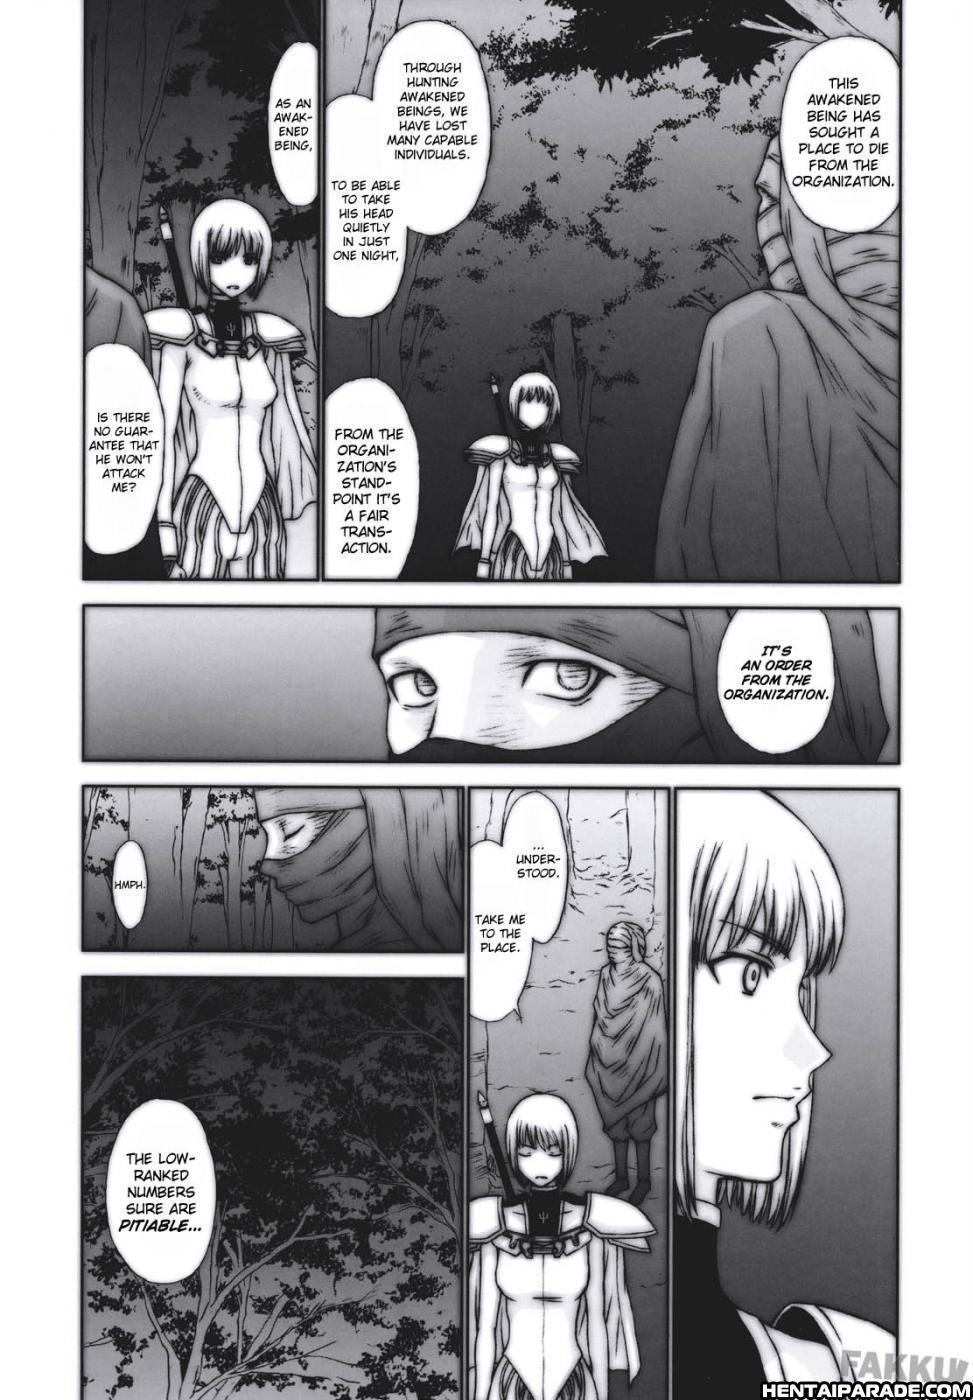 Claymore Dj - Doukoku No Ori 1 Manga Page 4 - Read Manga ...